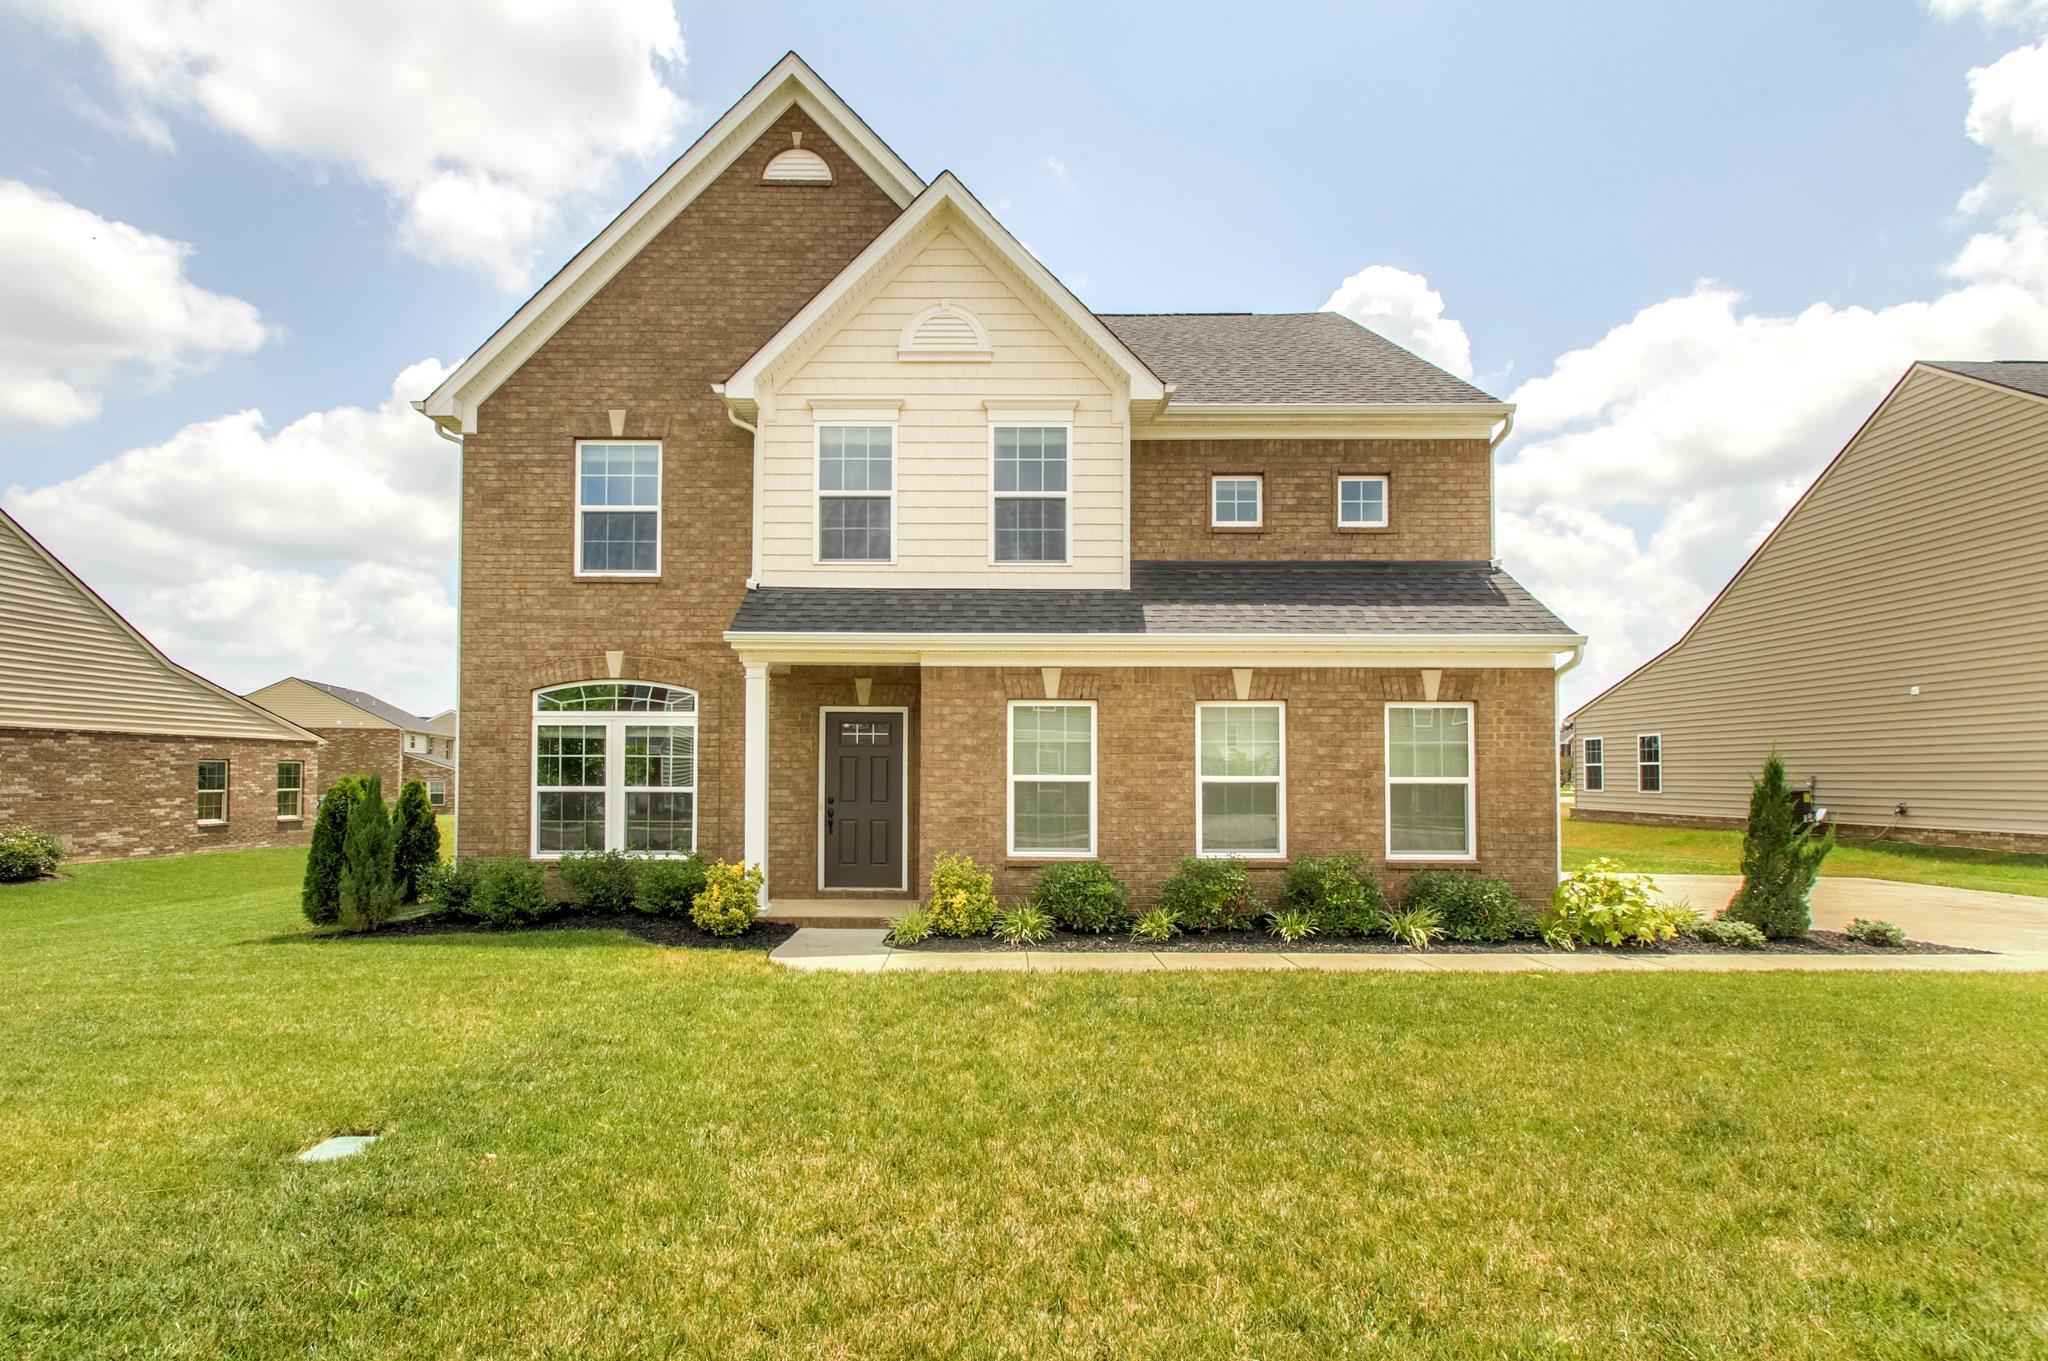 1305 Amboress Ln, Murfreesboro, TN 37128